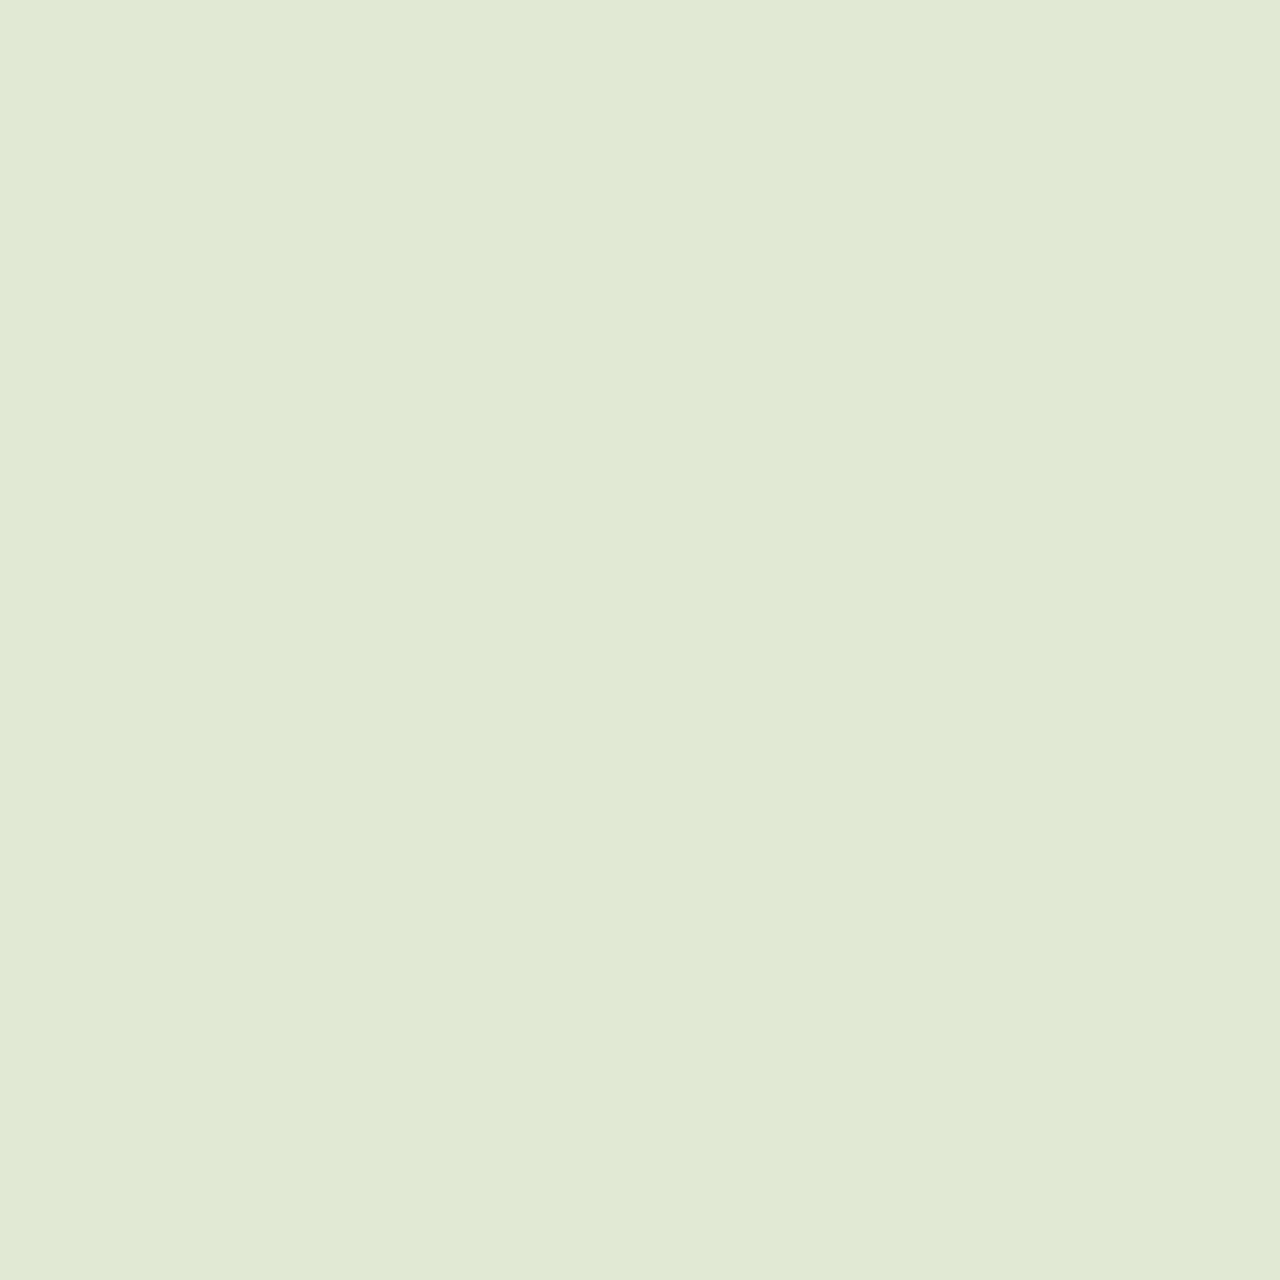 "#3316 Rosco Cinegel Tough 1/4 PlusGreen, 20x24"", Gels"